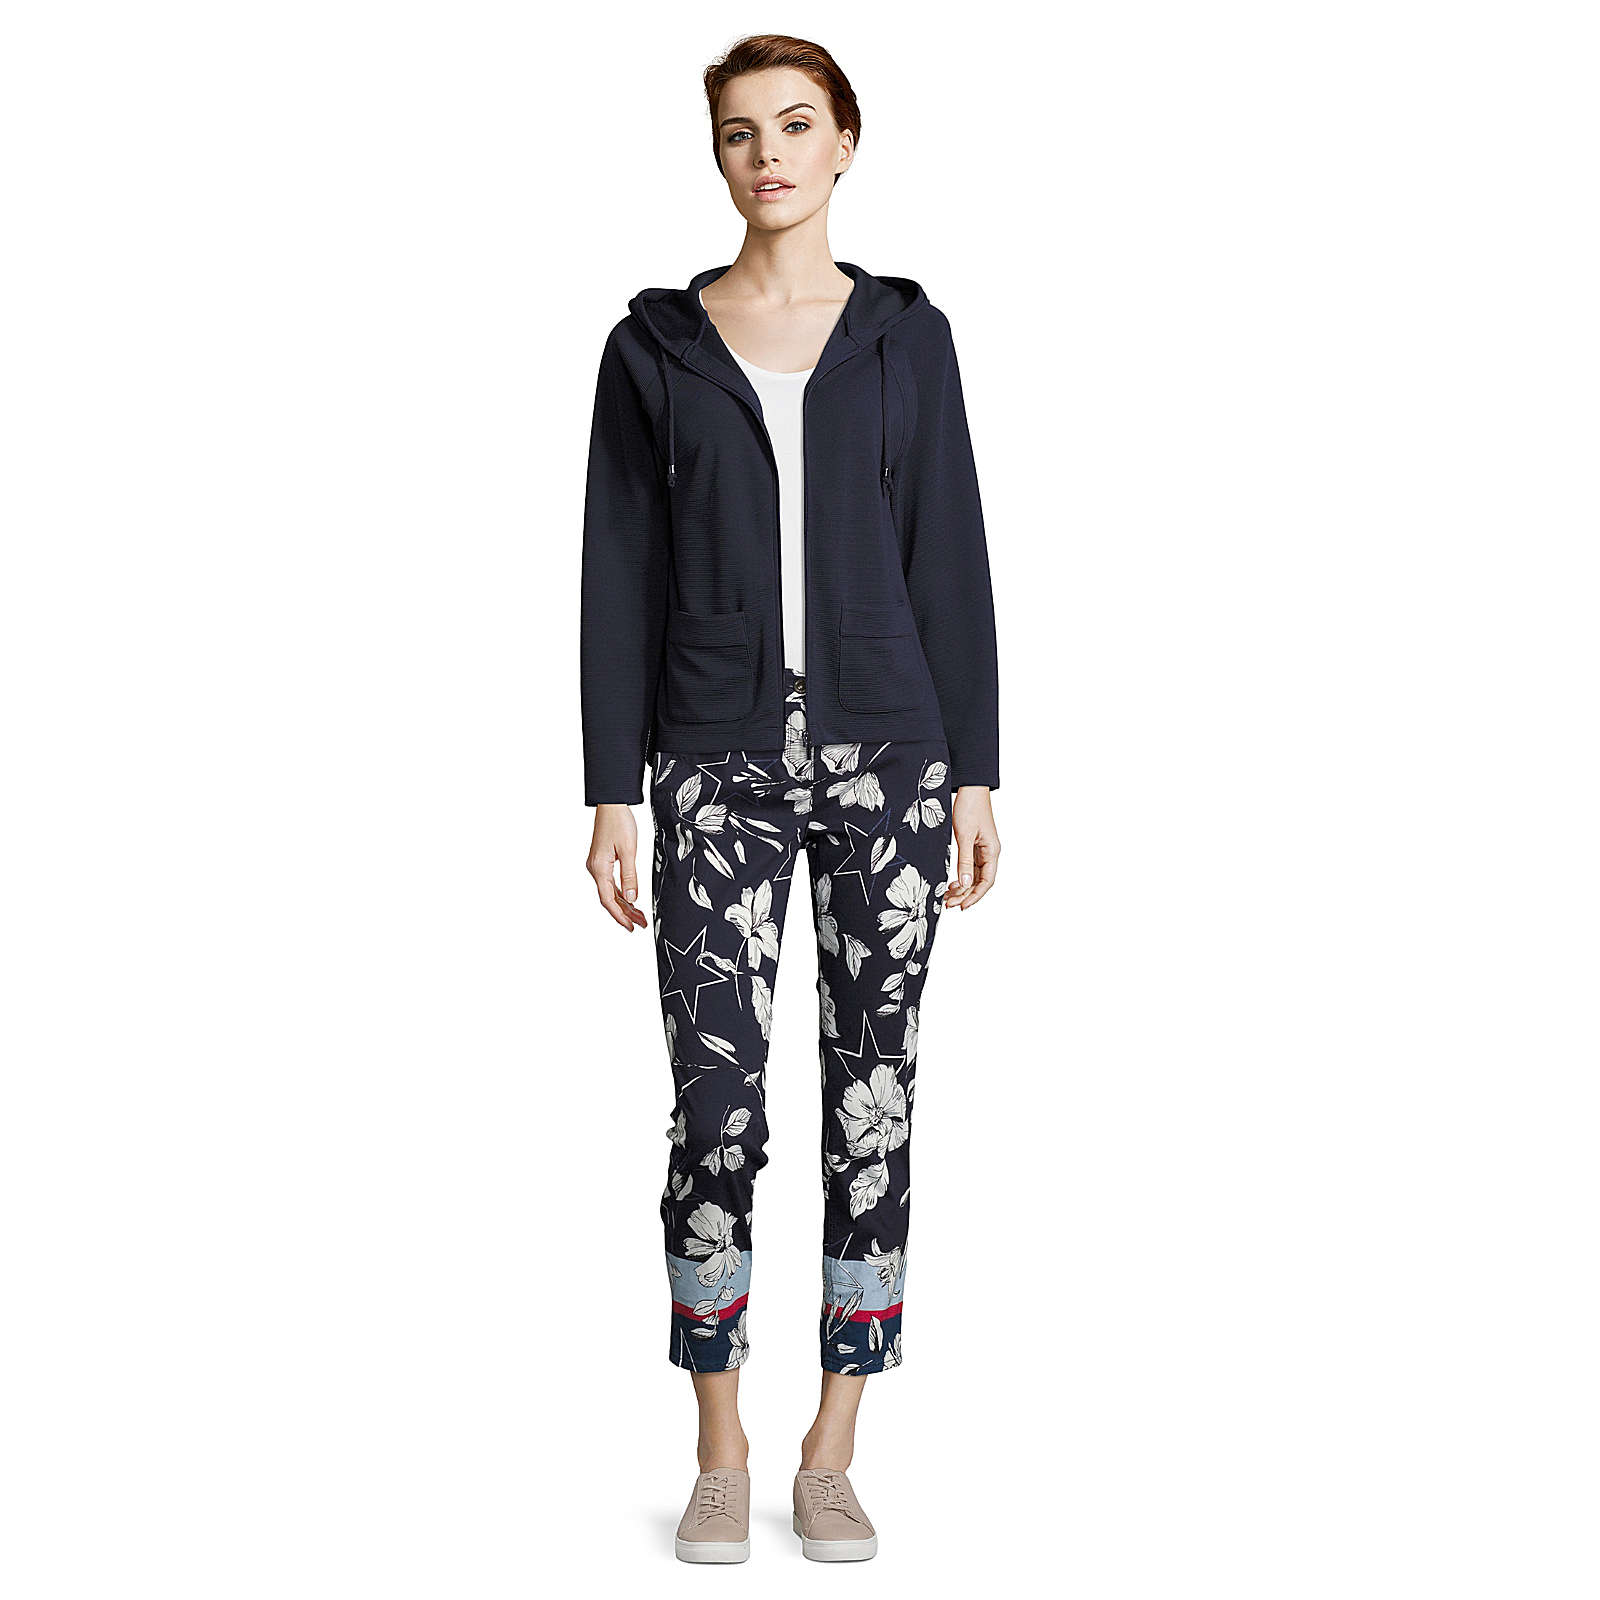 Betty & Co Sweatshirt-Jacke Sweatblazer mehrfarbig Damen Gr. 44